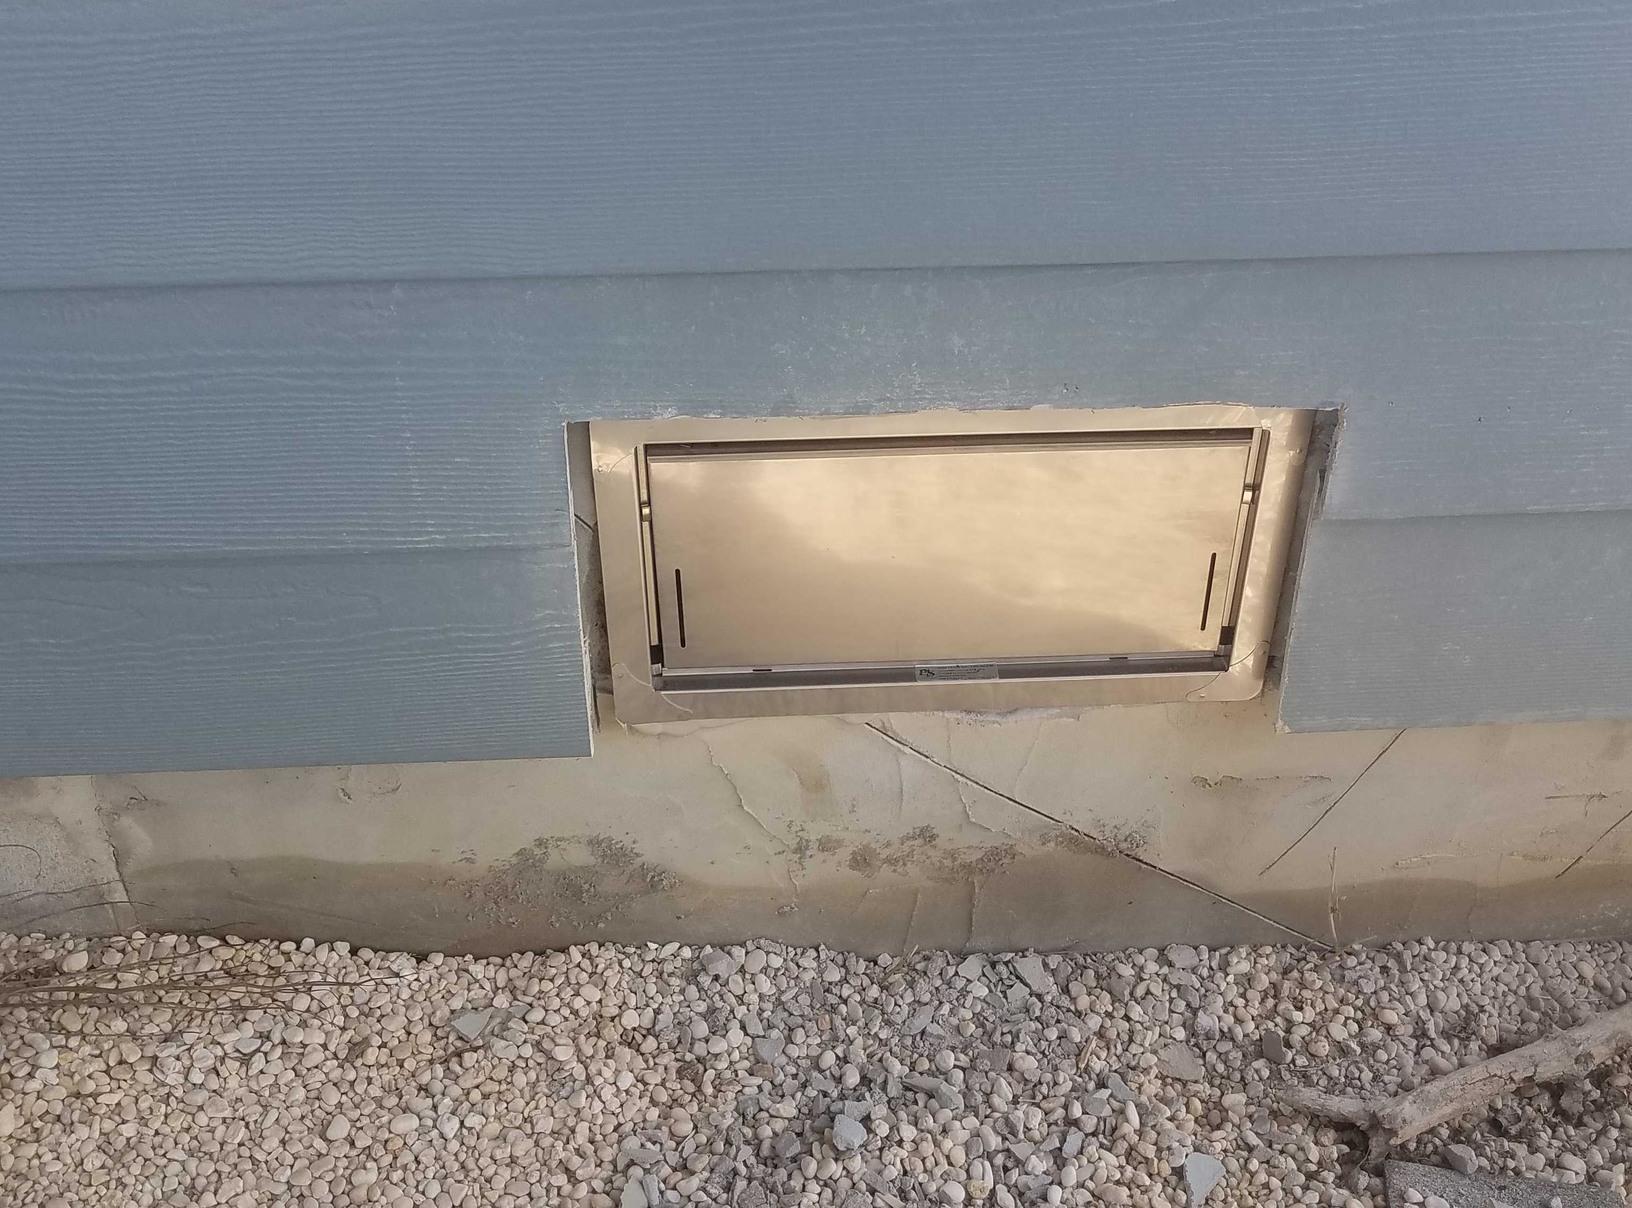 Installation of Smart Vent flood vents.